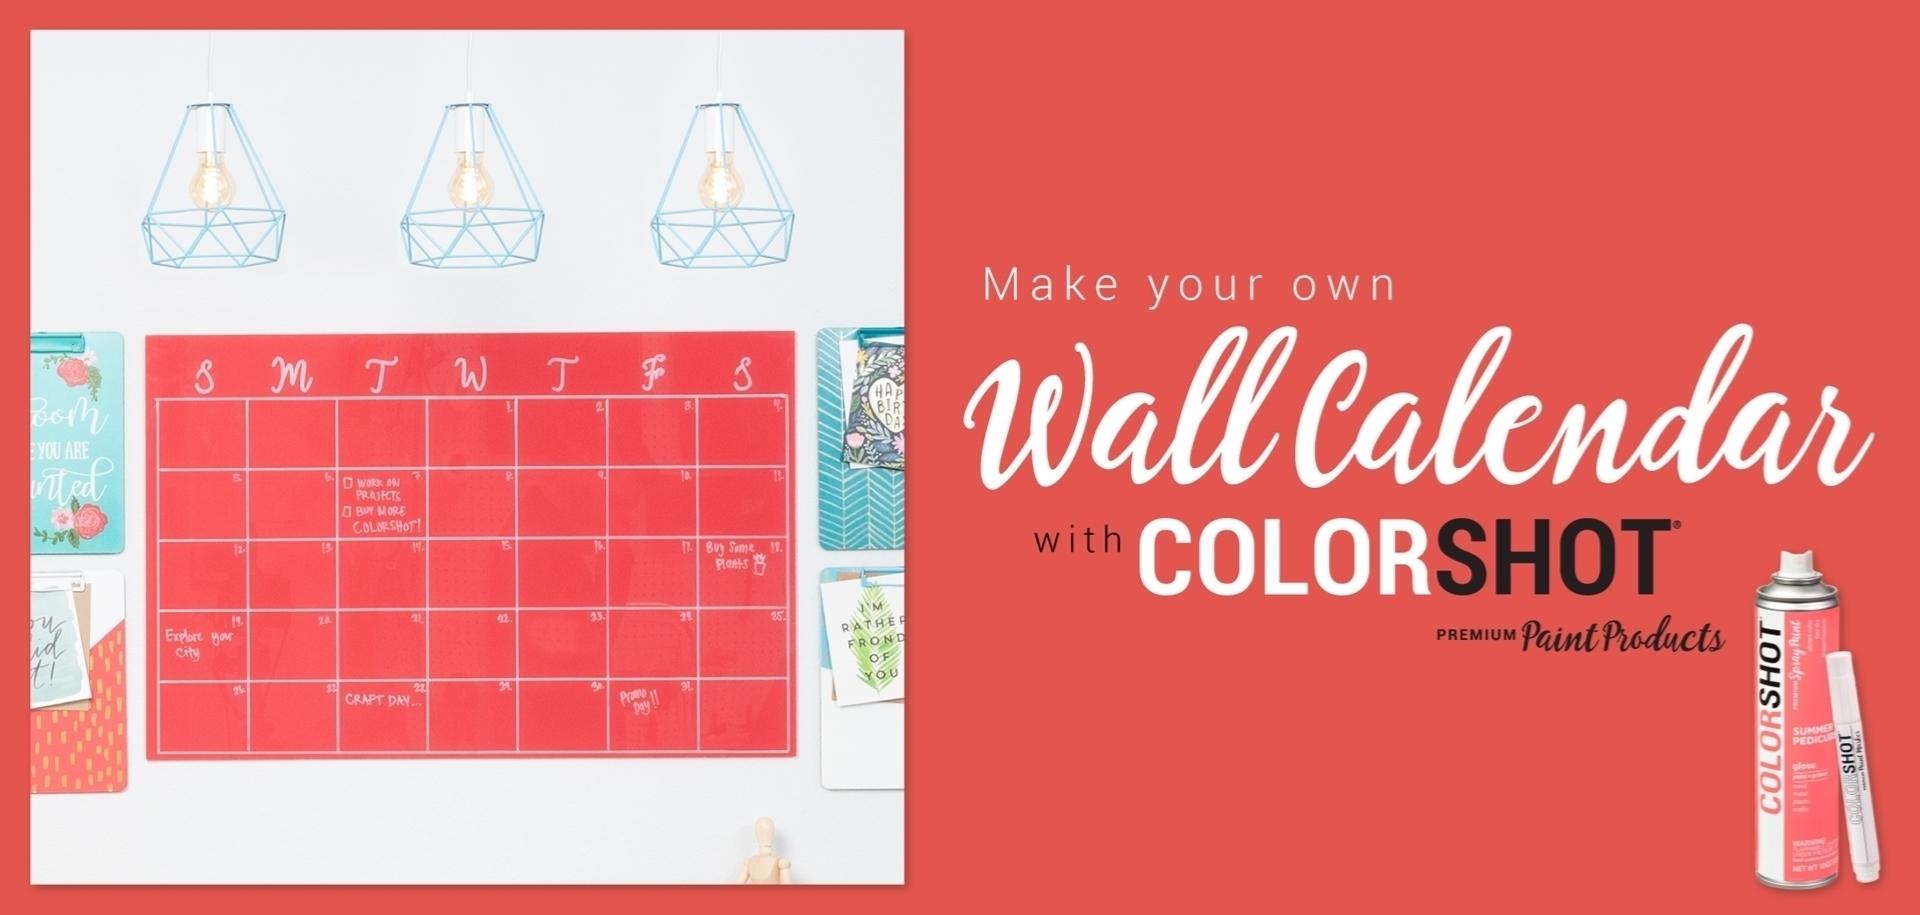 DIY Wall Calendar Project